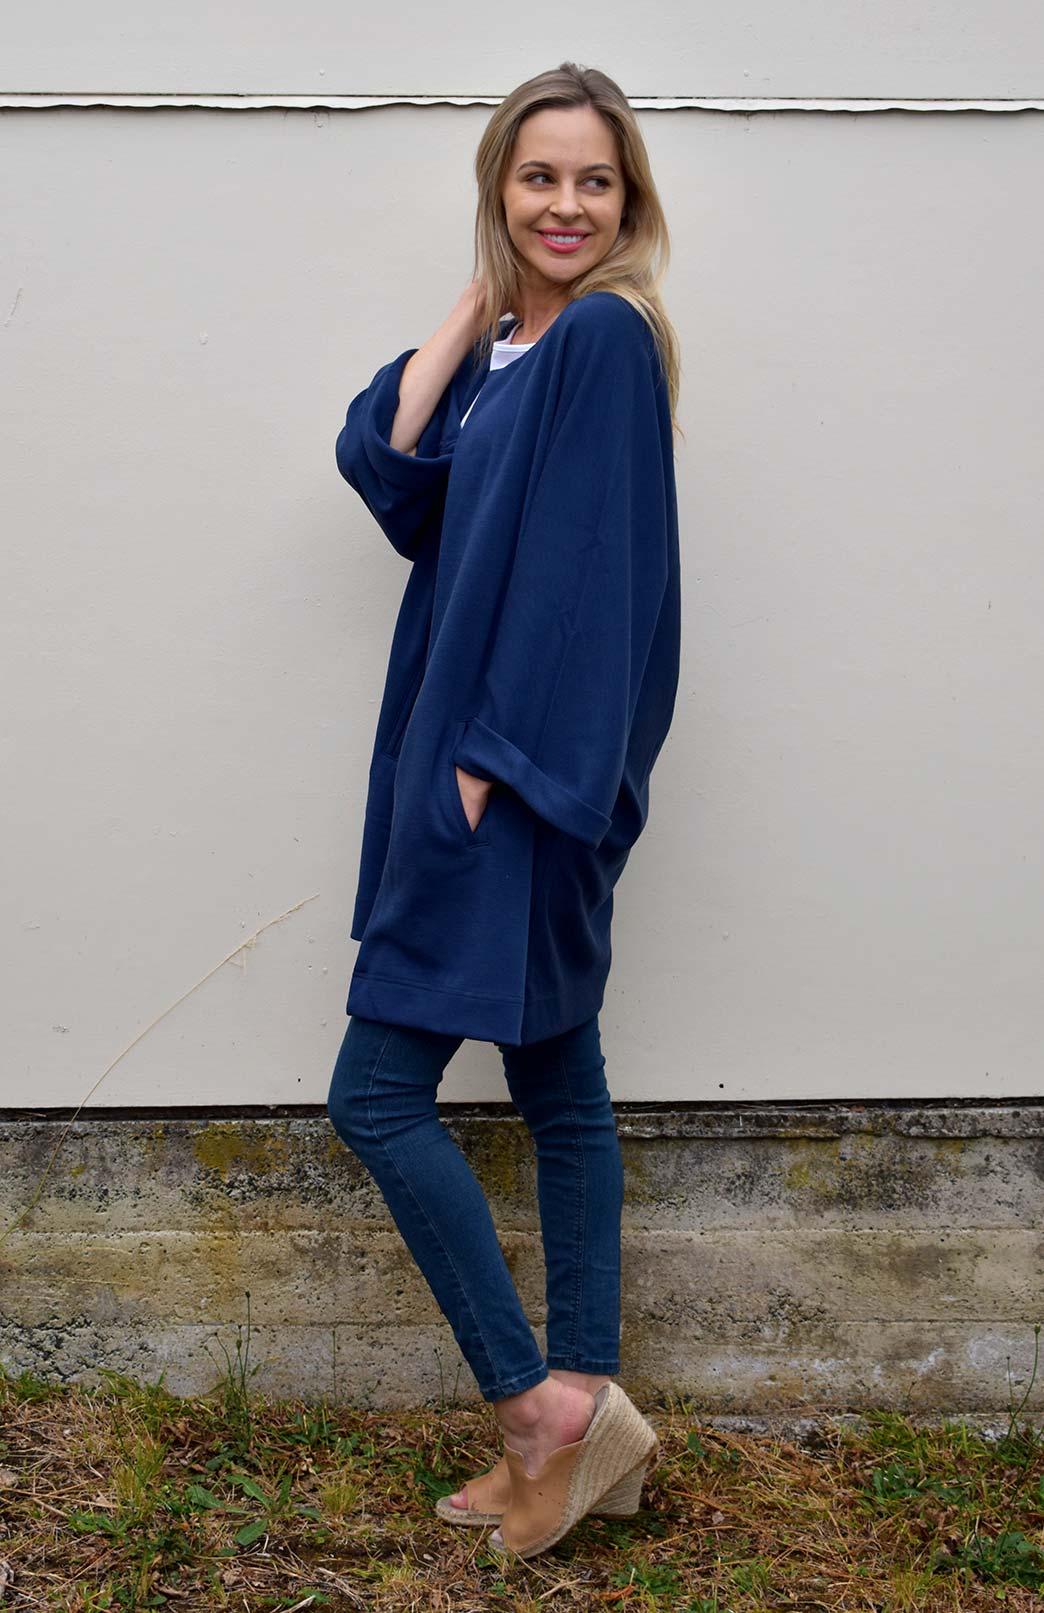 Kimono Coat - Women's Indigo Blue Heavyweight Woollen Kimono Coat with hook and eye fastening and side pockets - Smitten Merino Tasmania Australia